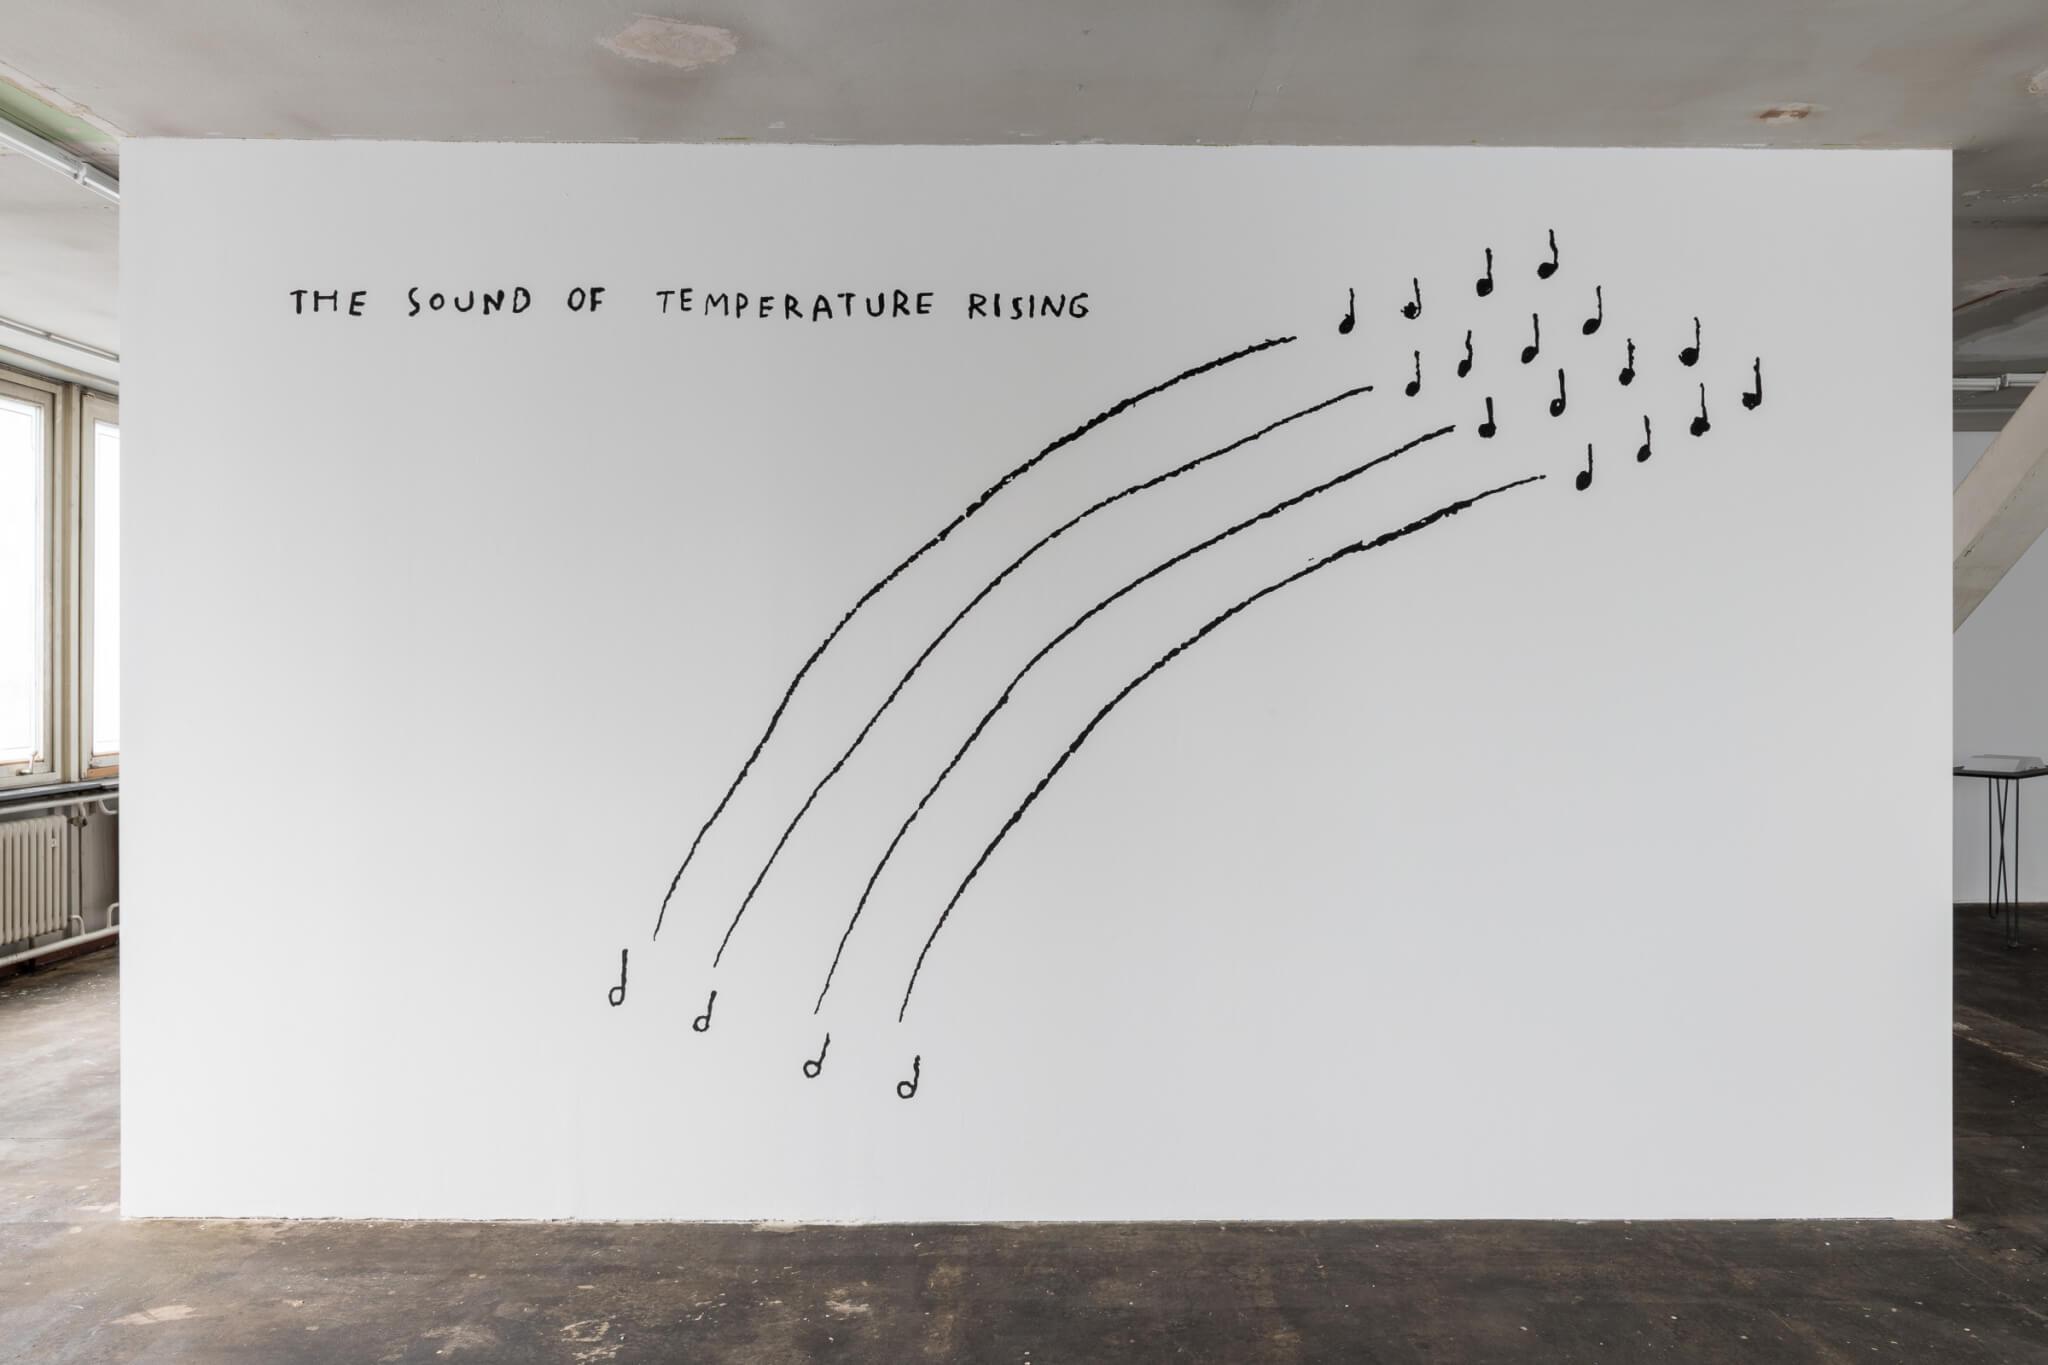 Kim, The Sound of Temperature Rising, 2019 (CSK 19.015)